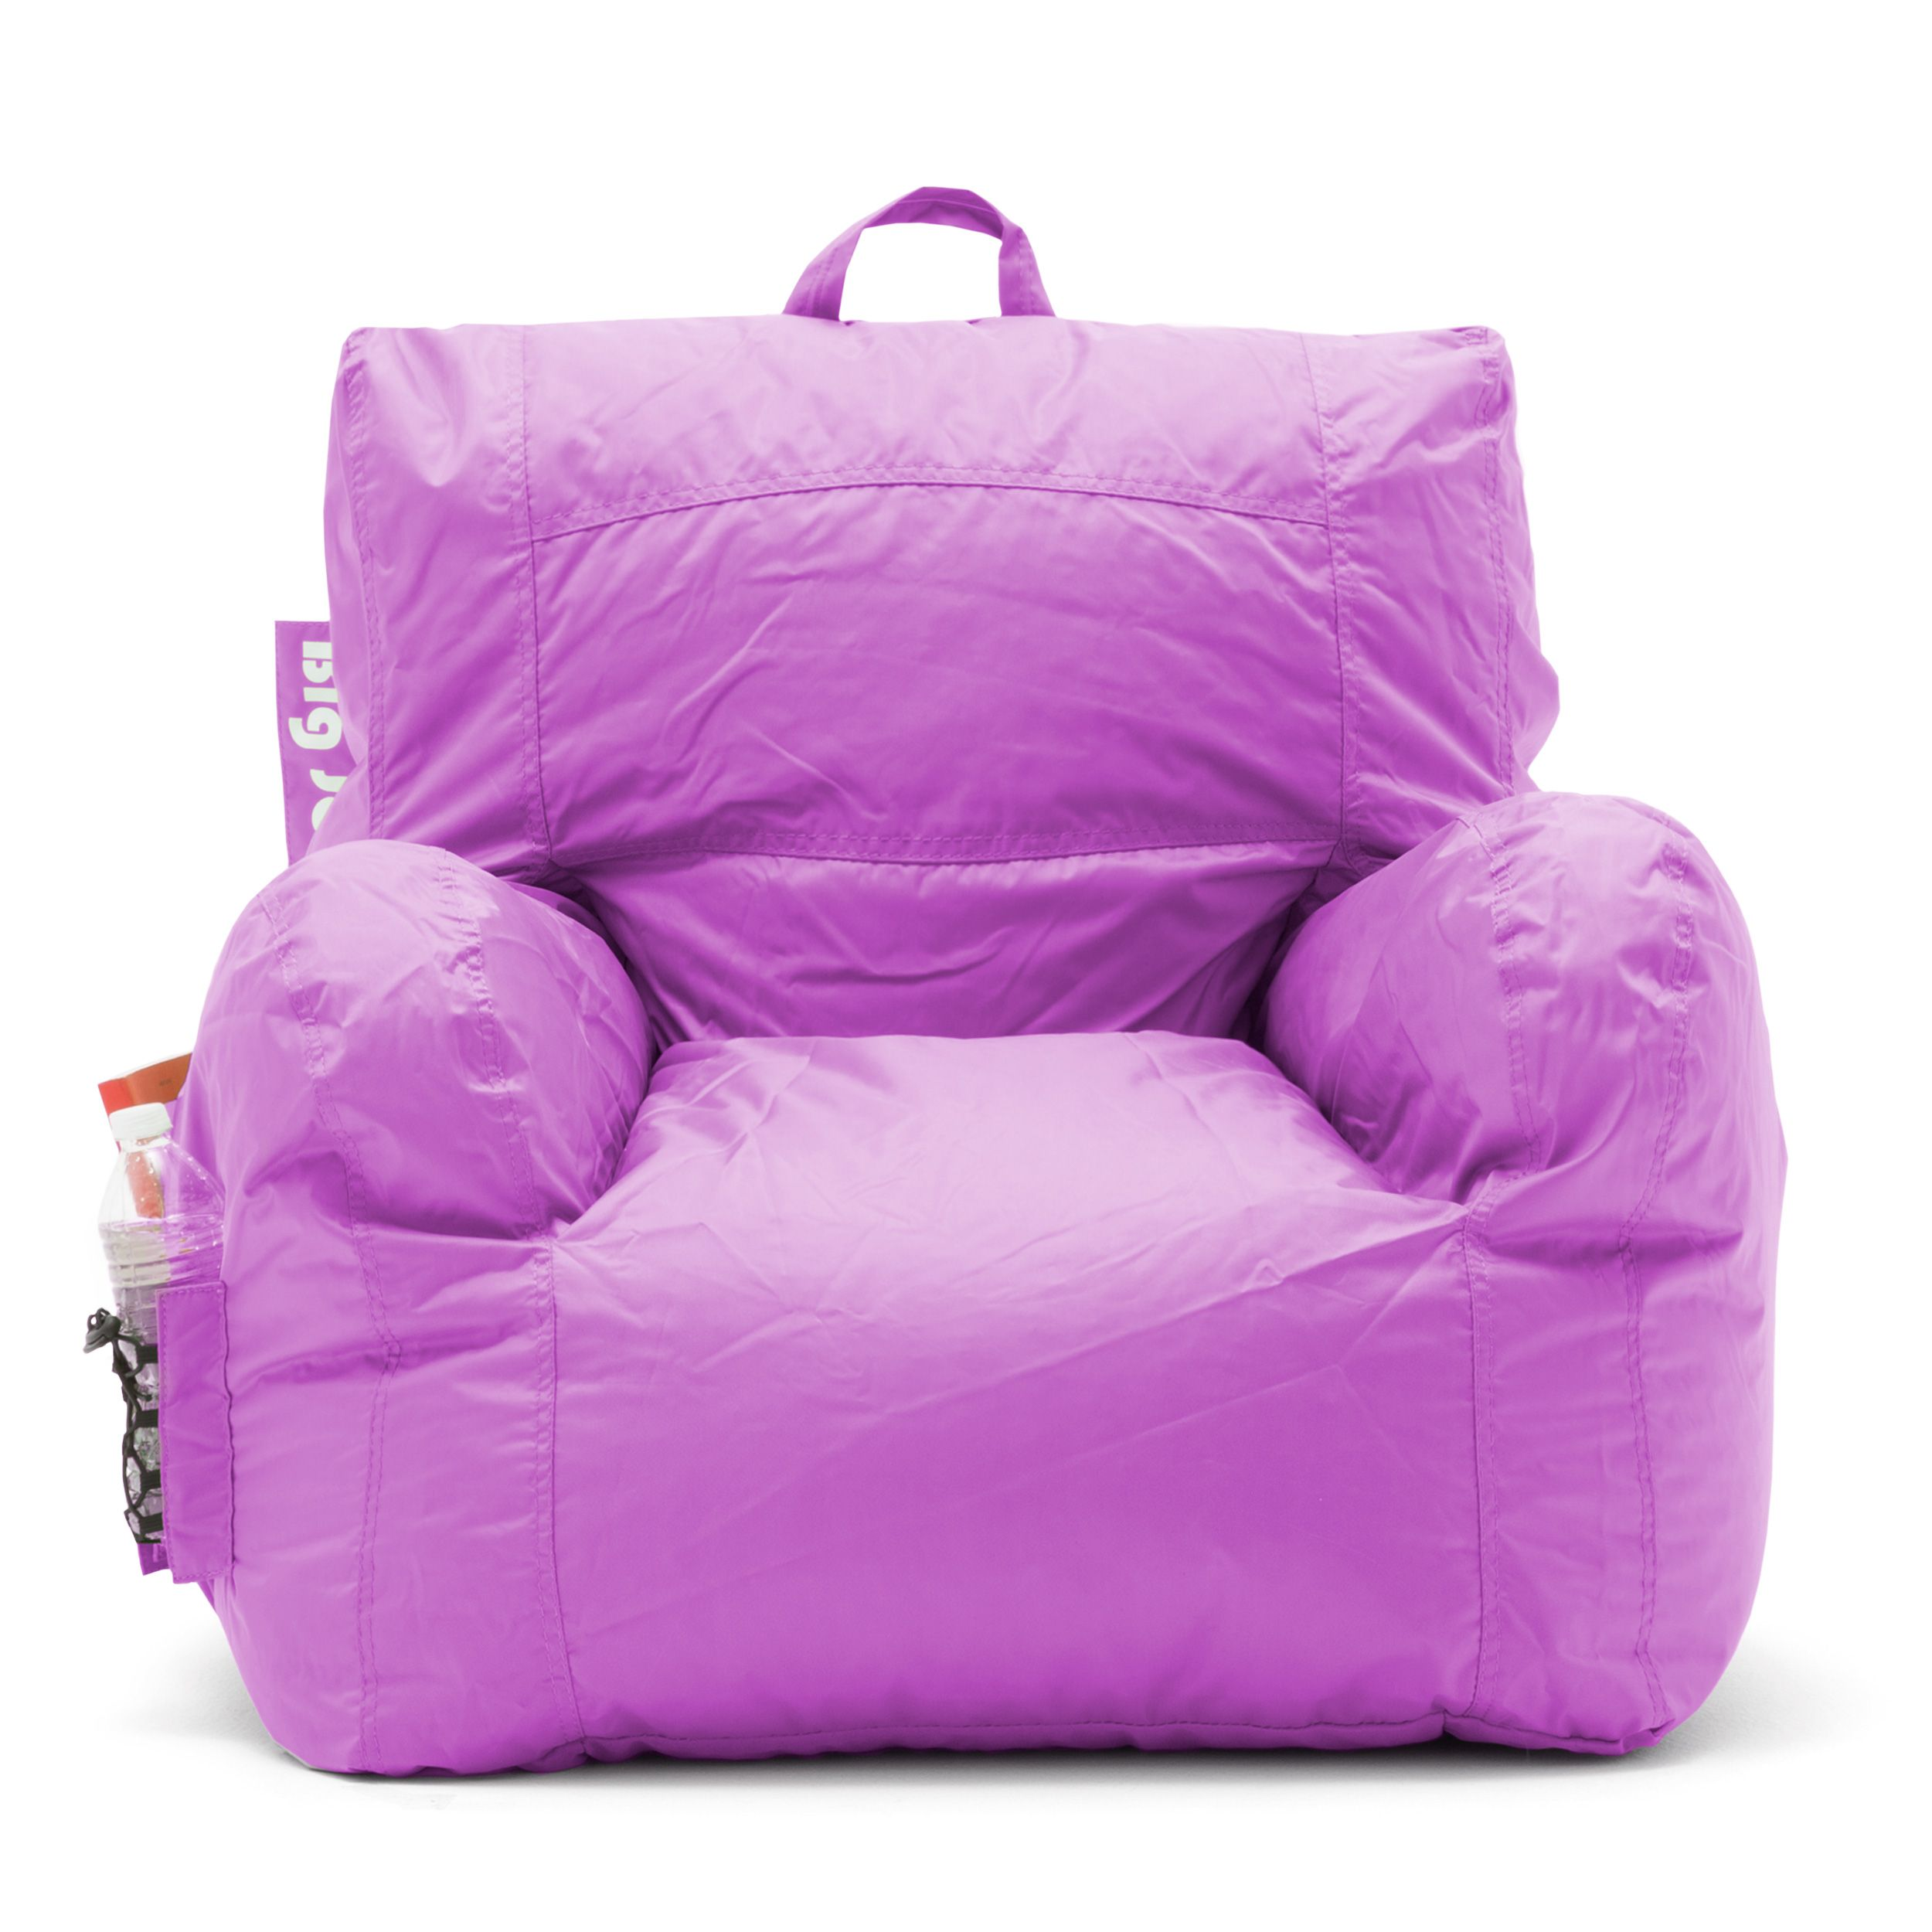 "Big Joe Bean Bag Chair, Multiple Colors 33"" x 32"" x 25"""